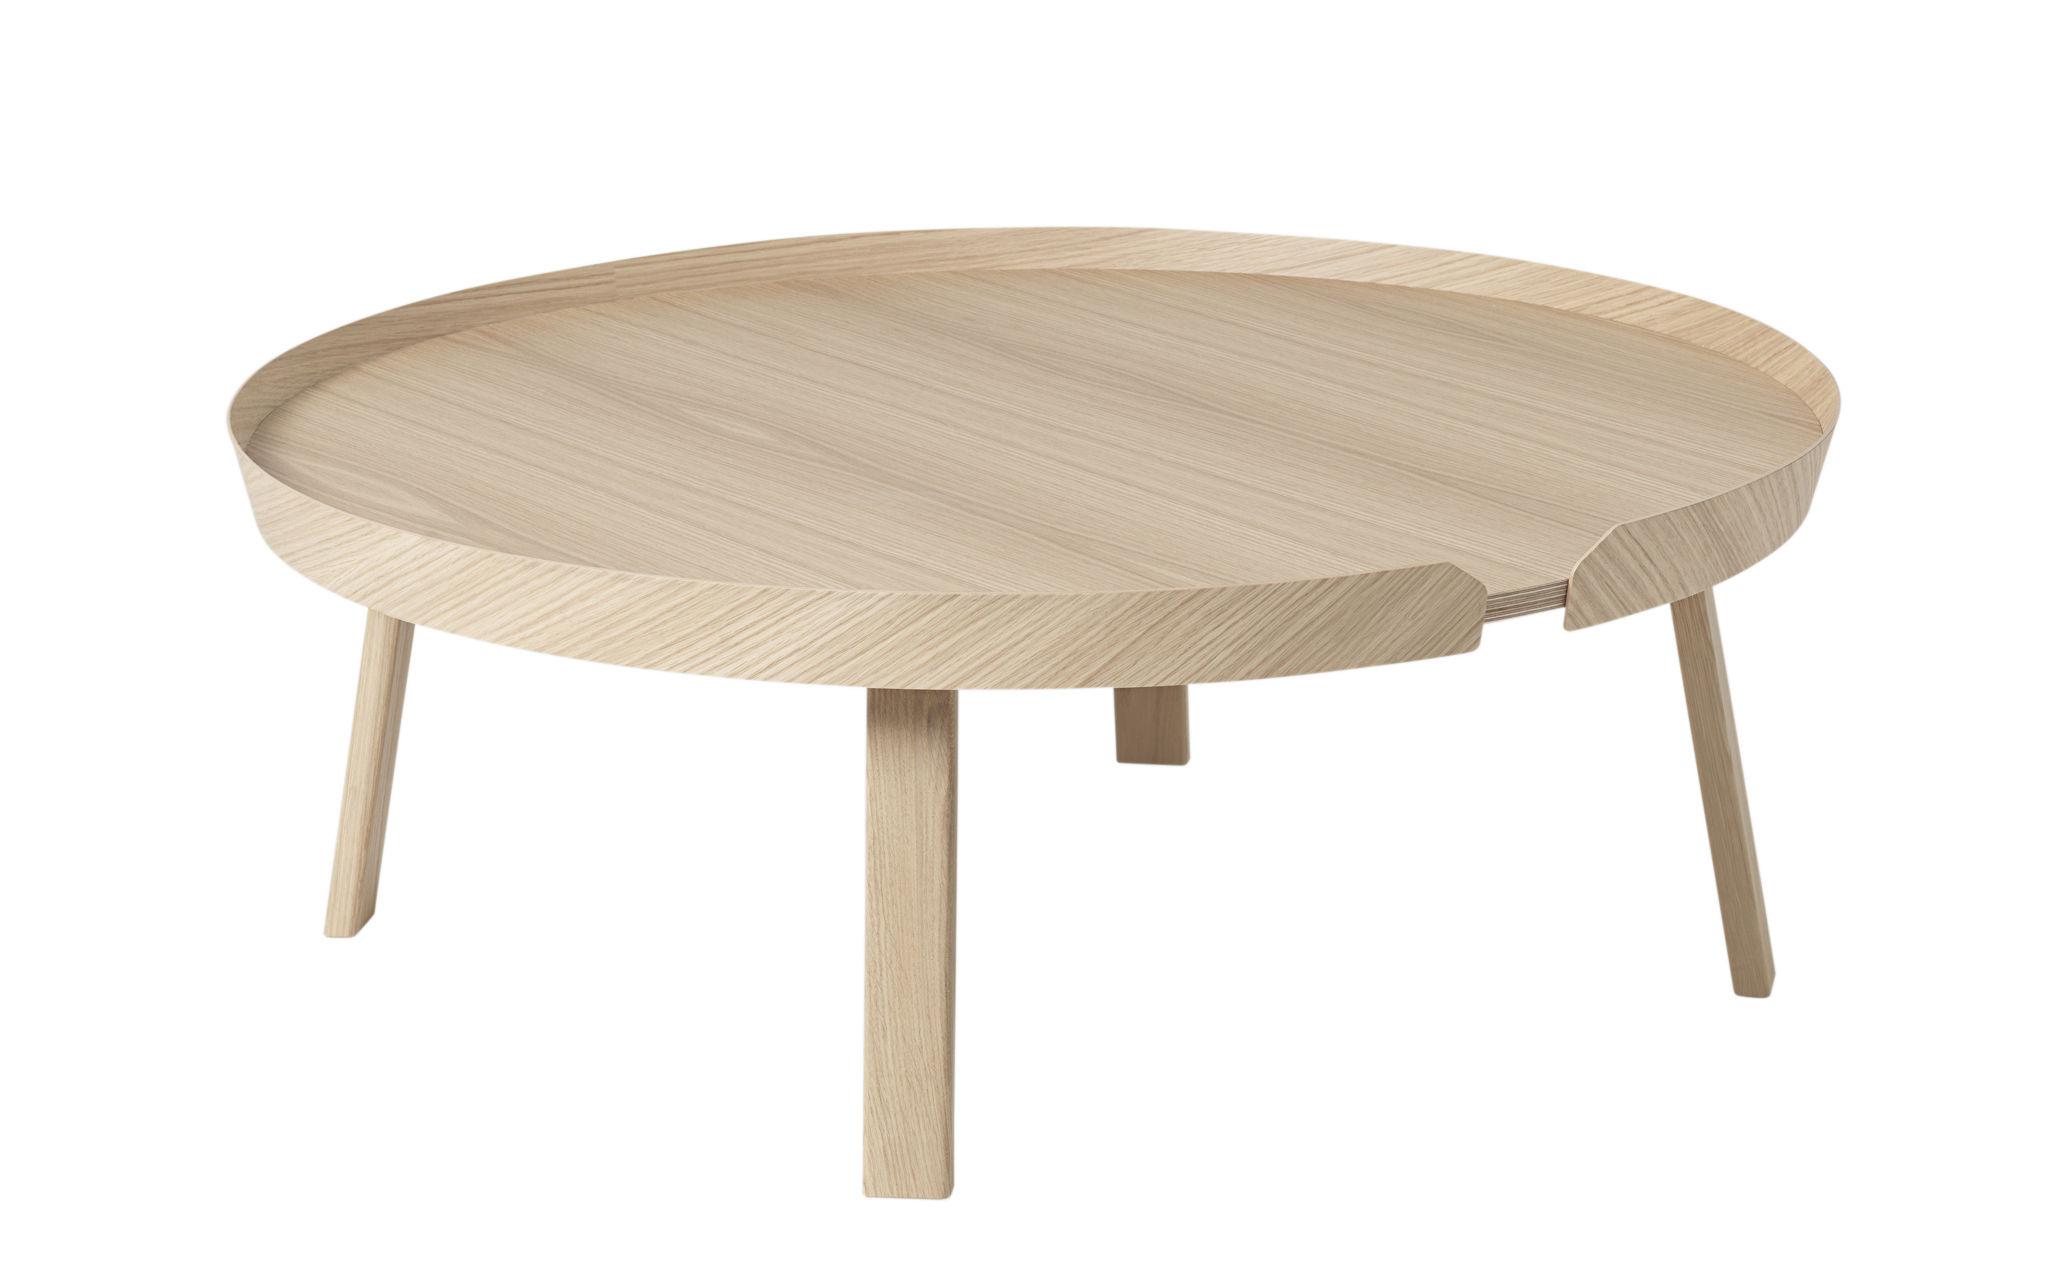 Arredamento - Tavolini  - Tavolino basso Around XL / Ø 95 x H 36 cm - Muuto - Rovere naturale - Frassino tinto